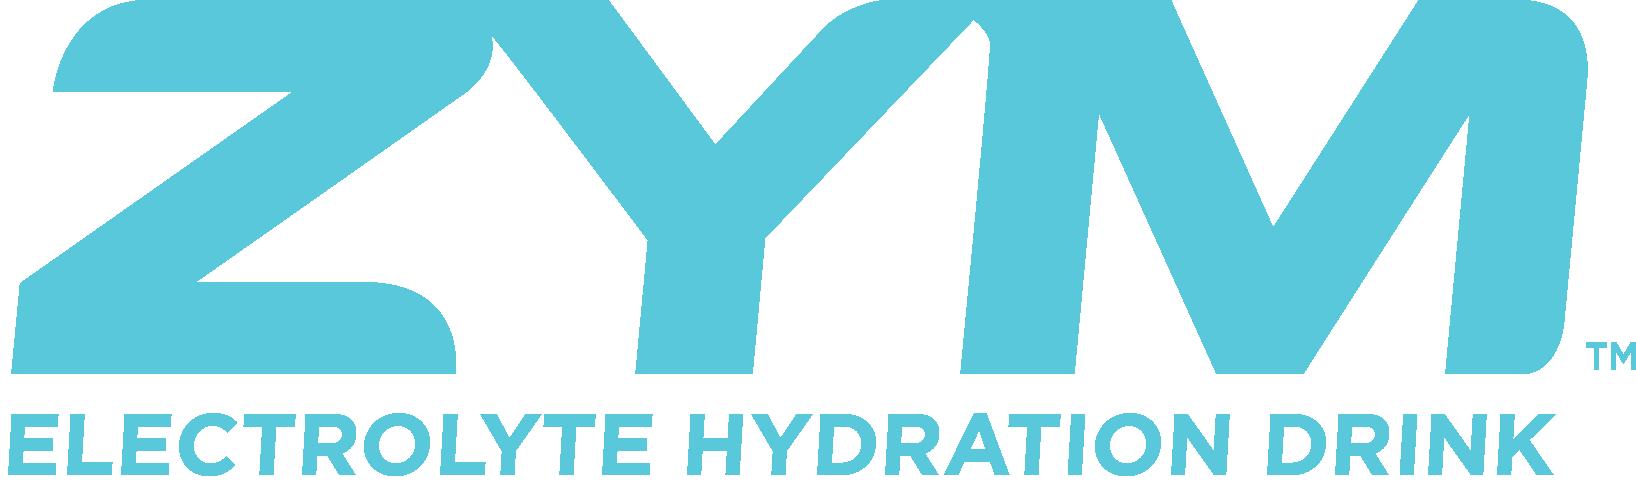 ZYM Electrolyte Hydration Drink